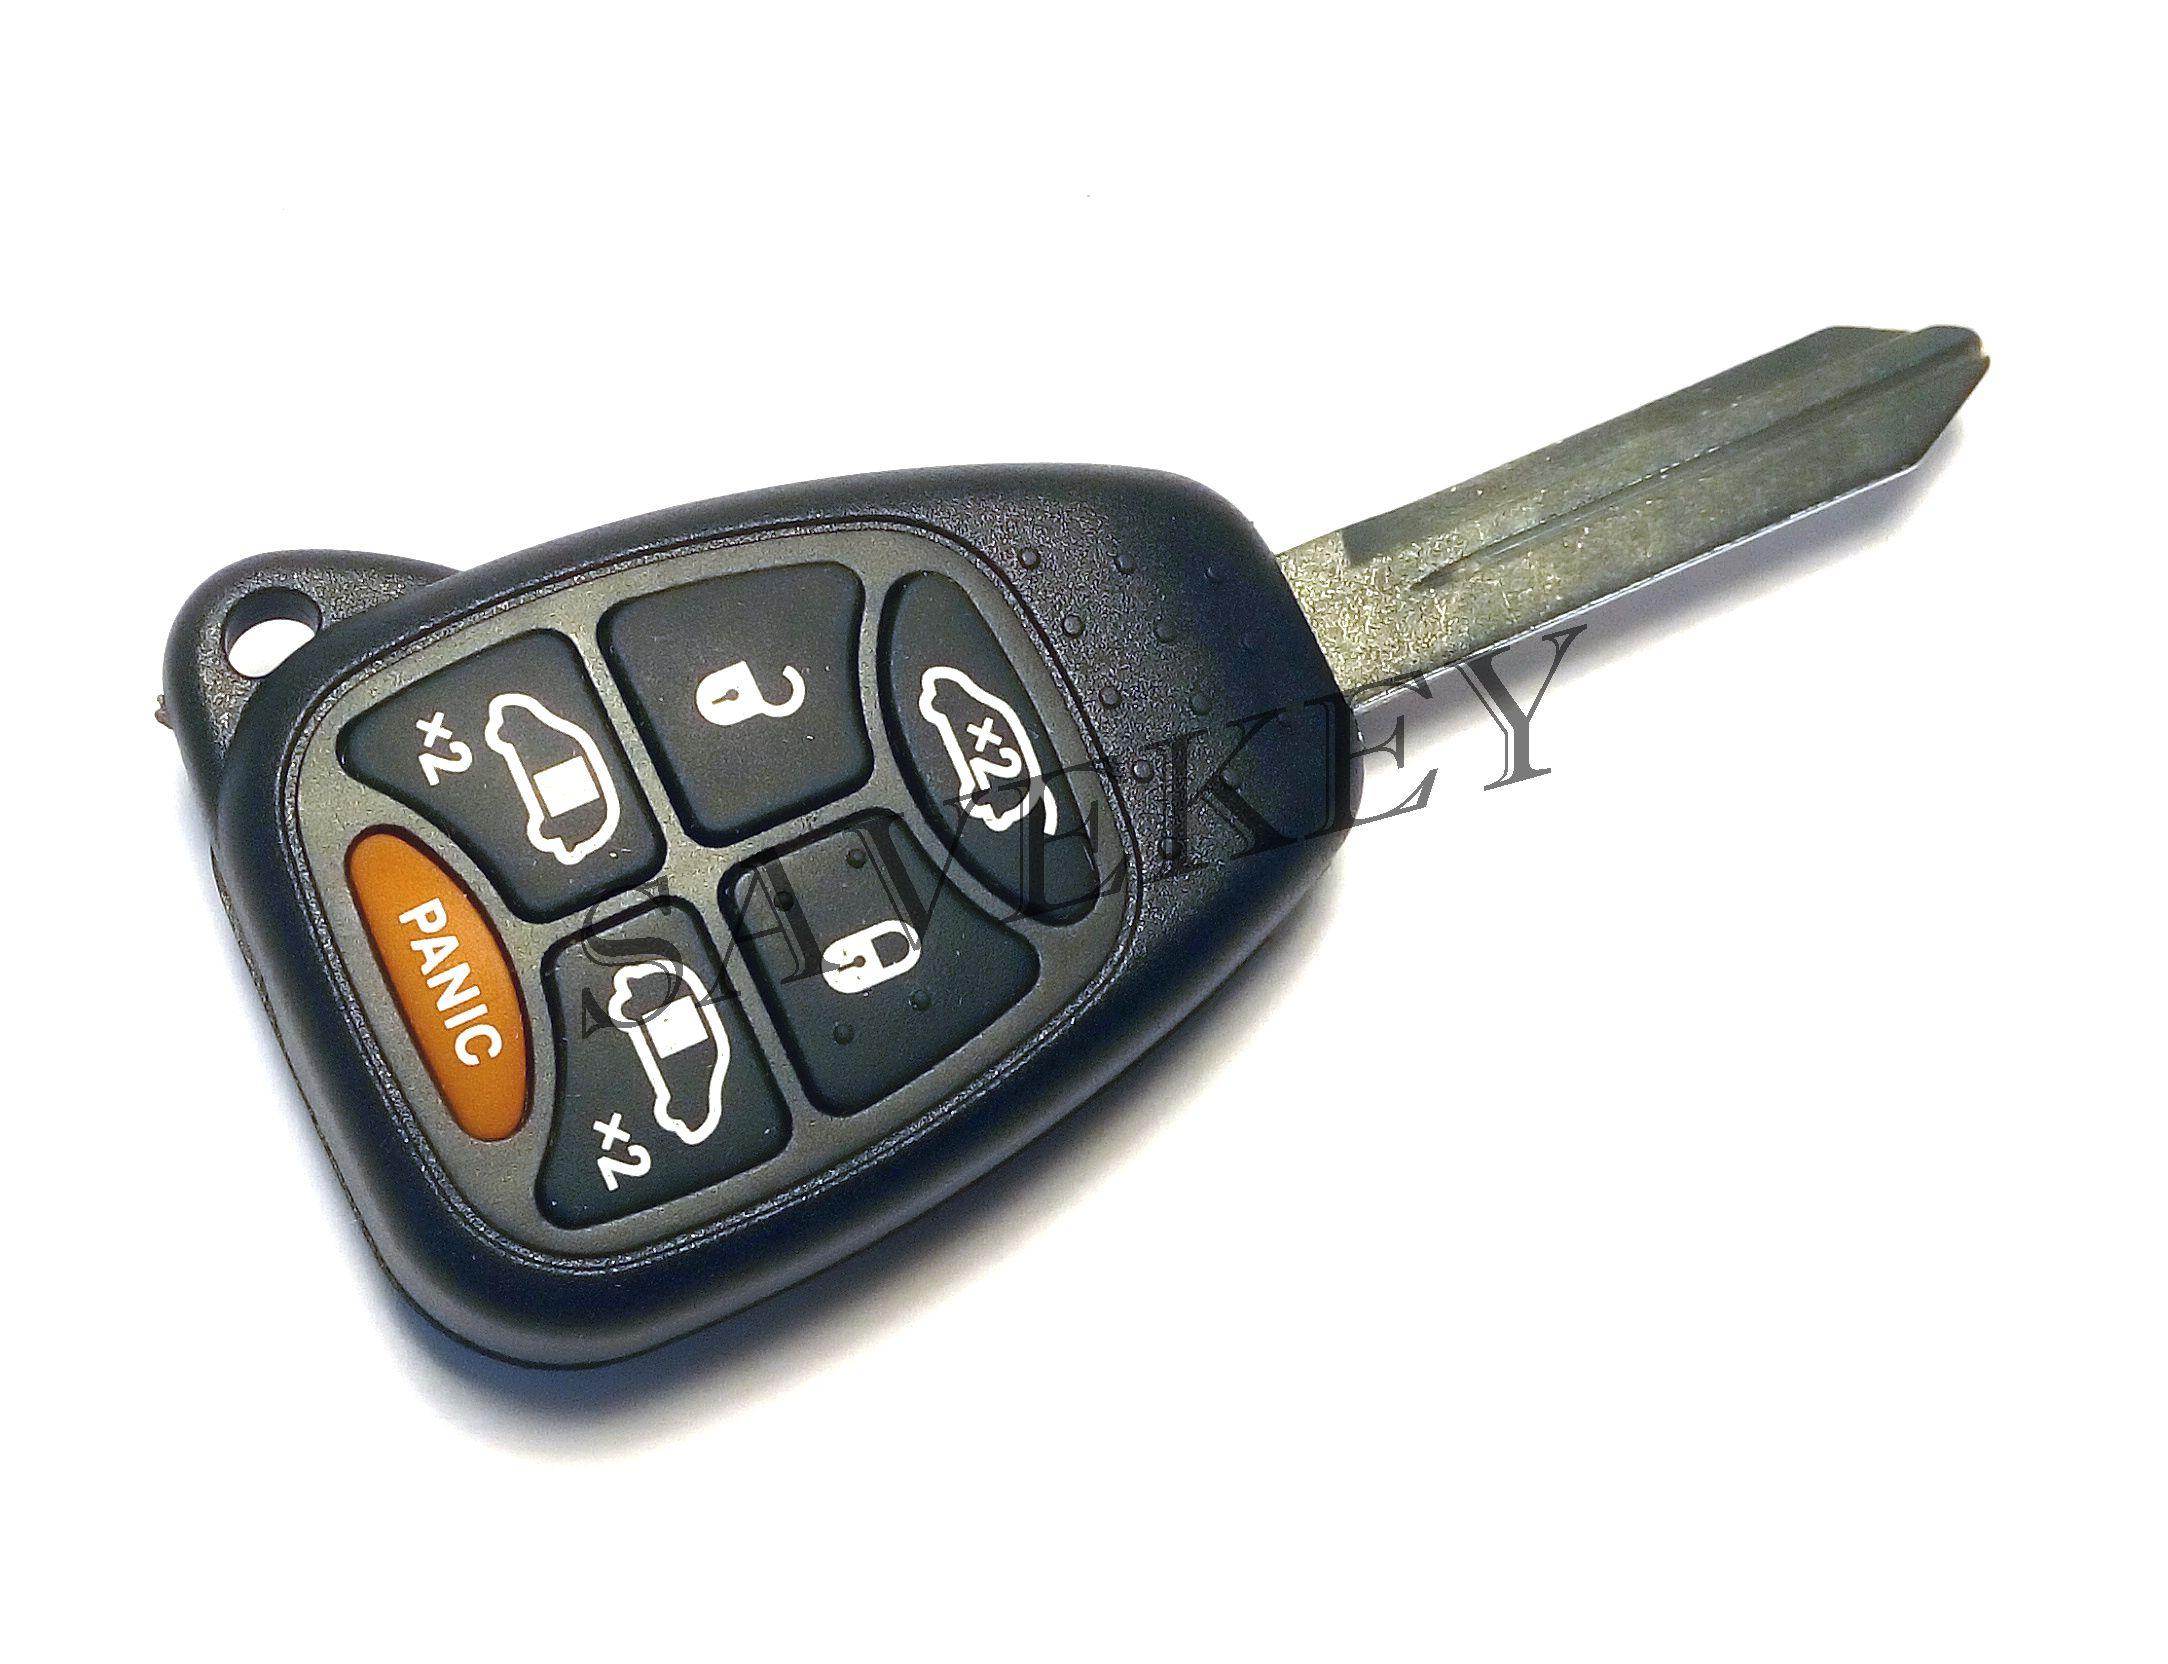 Дистанционный ключ Jeep для моделей PACIFICA, LIBERTY, COMPASS, CHEROKEE, LIBERTY, WRANGLER 6 кнопок 433 Mhz